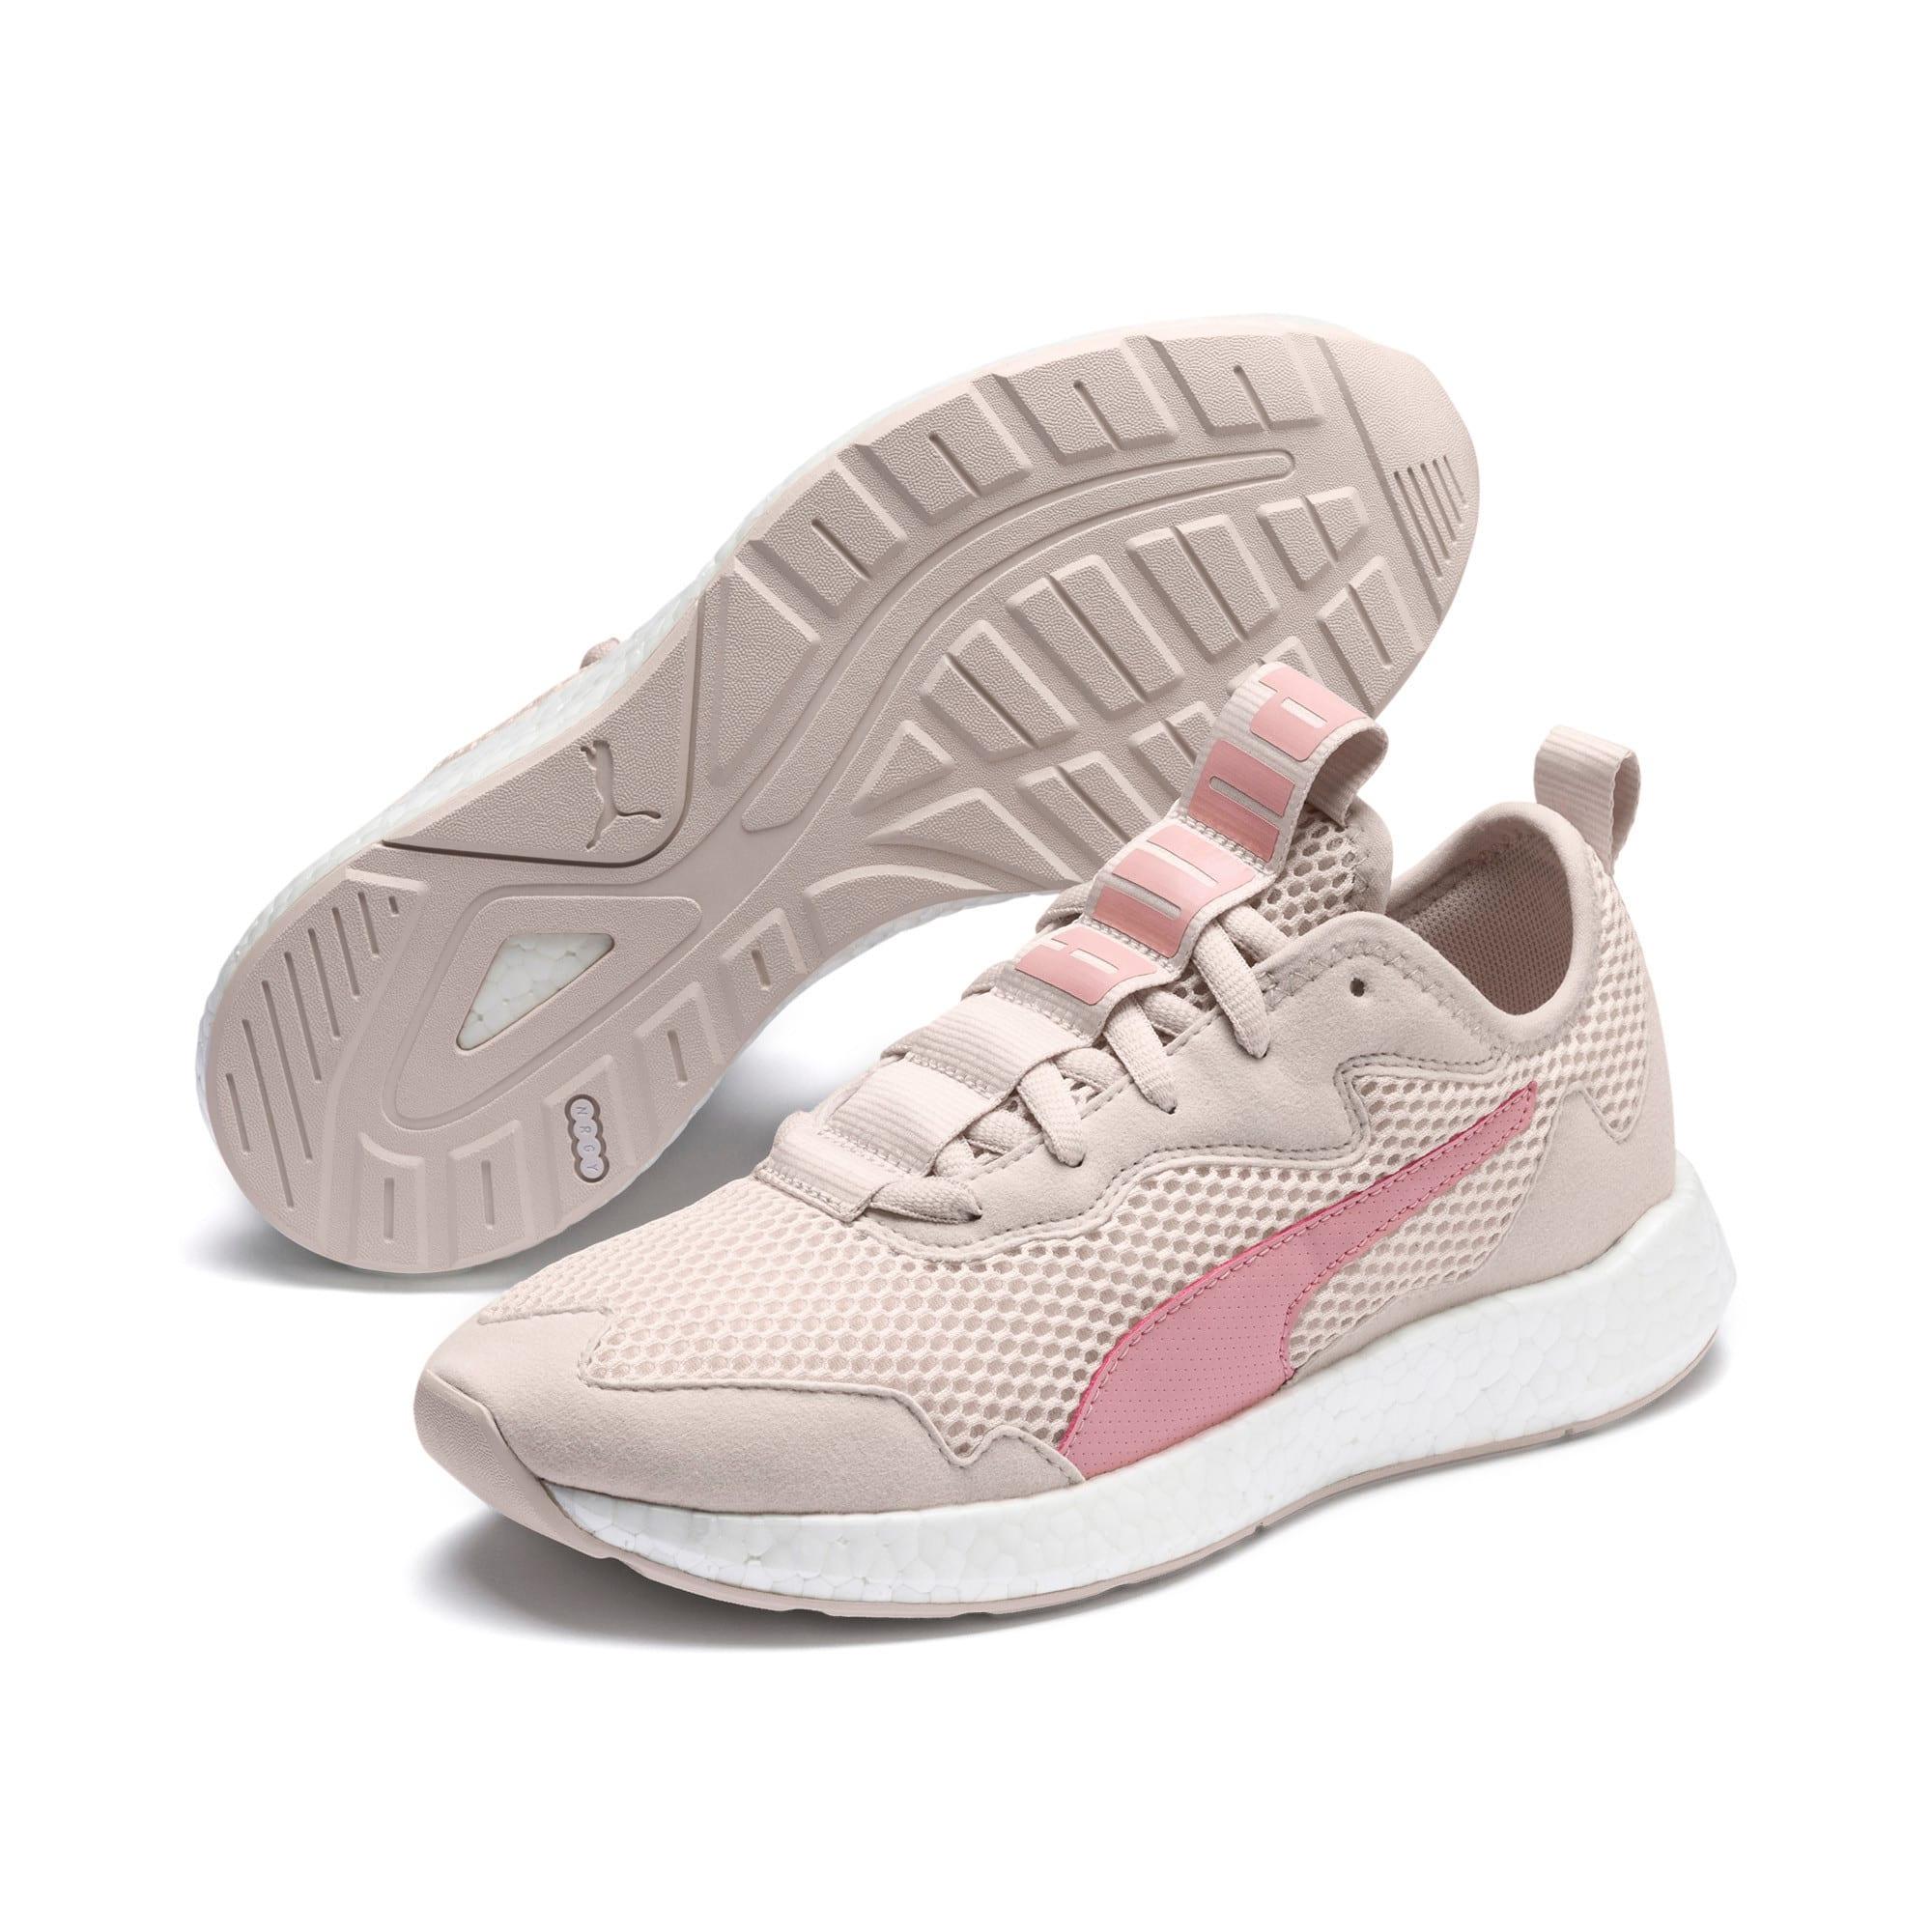 Thumbnail 8 of NRGY Neko Skim Women's Running Shoes, Pastel Parchment-Bridal Rose, medium-IND